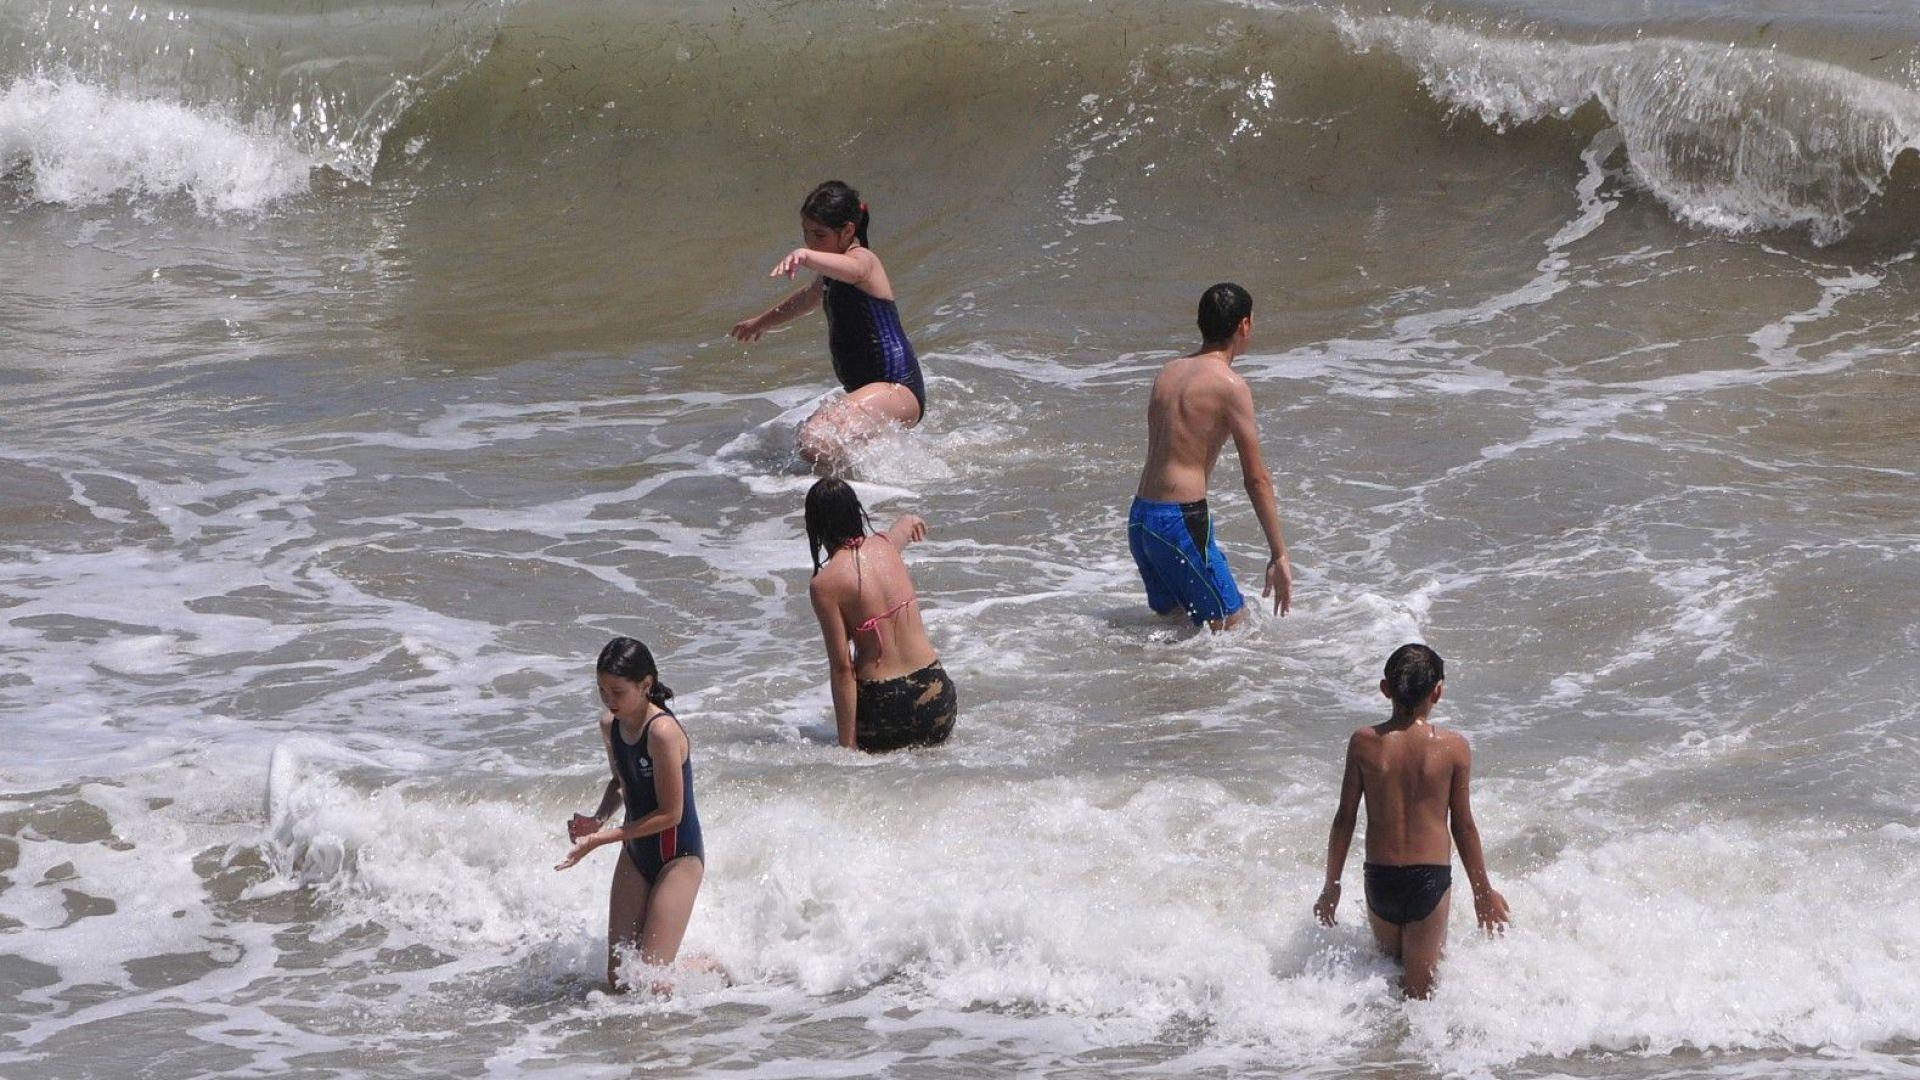 Намериха трупа на удавеното дете в Бургас